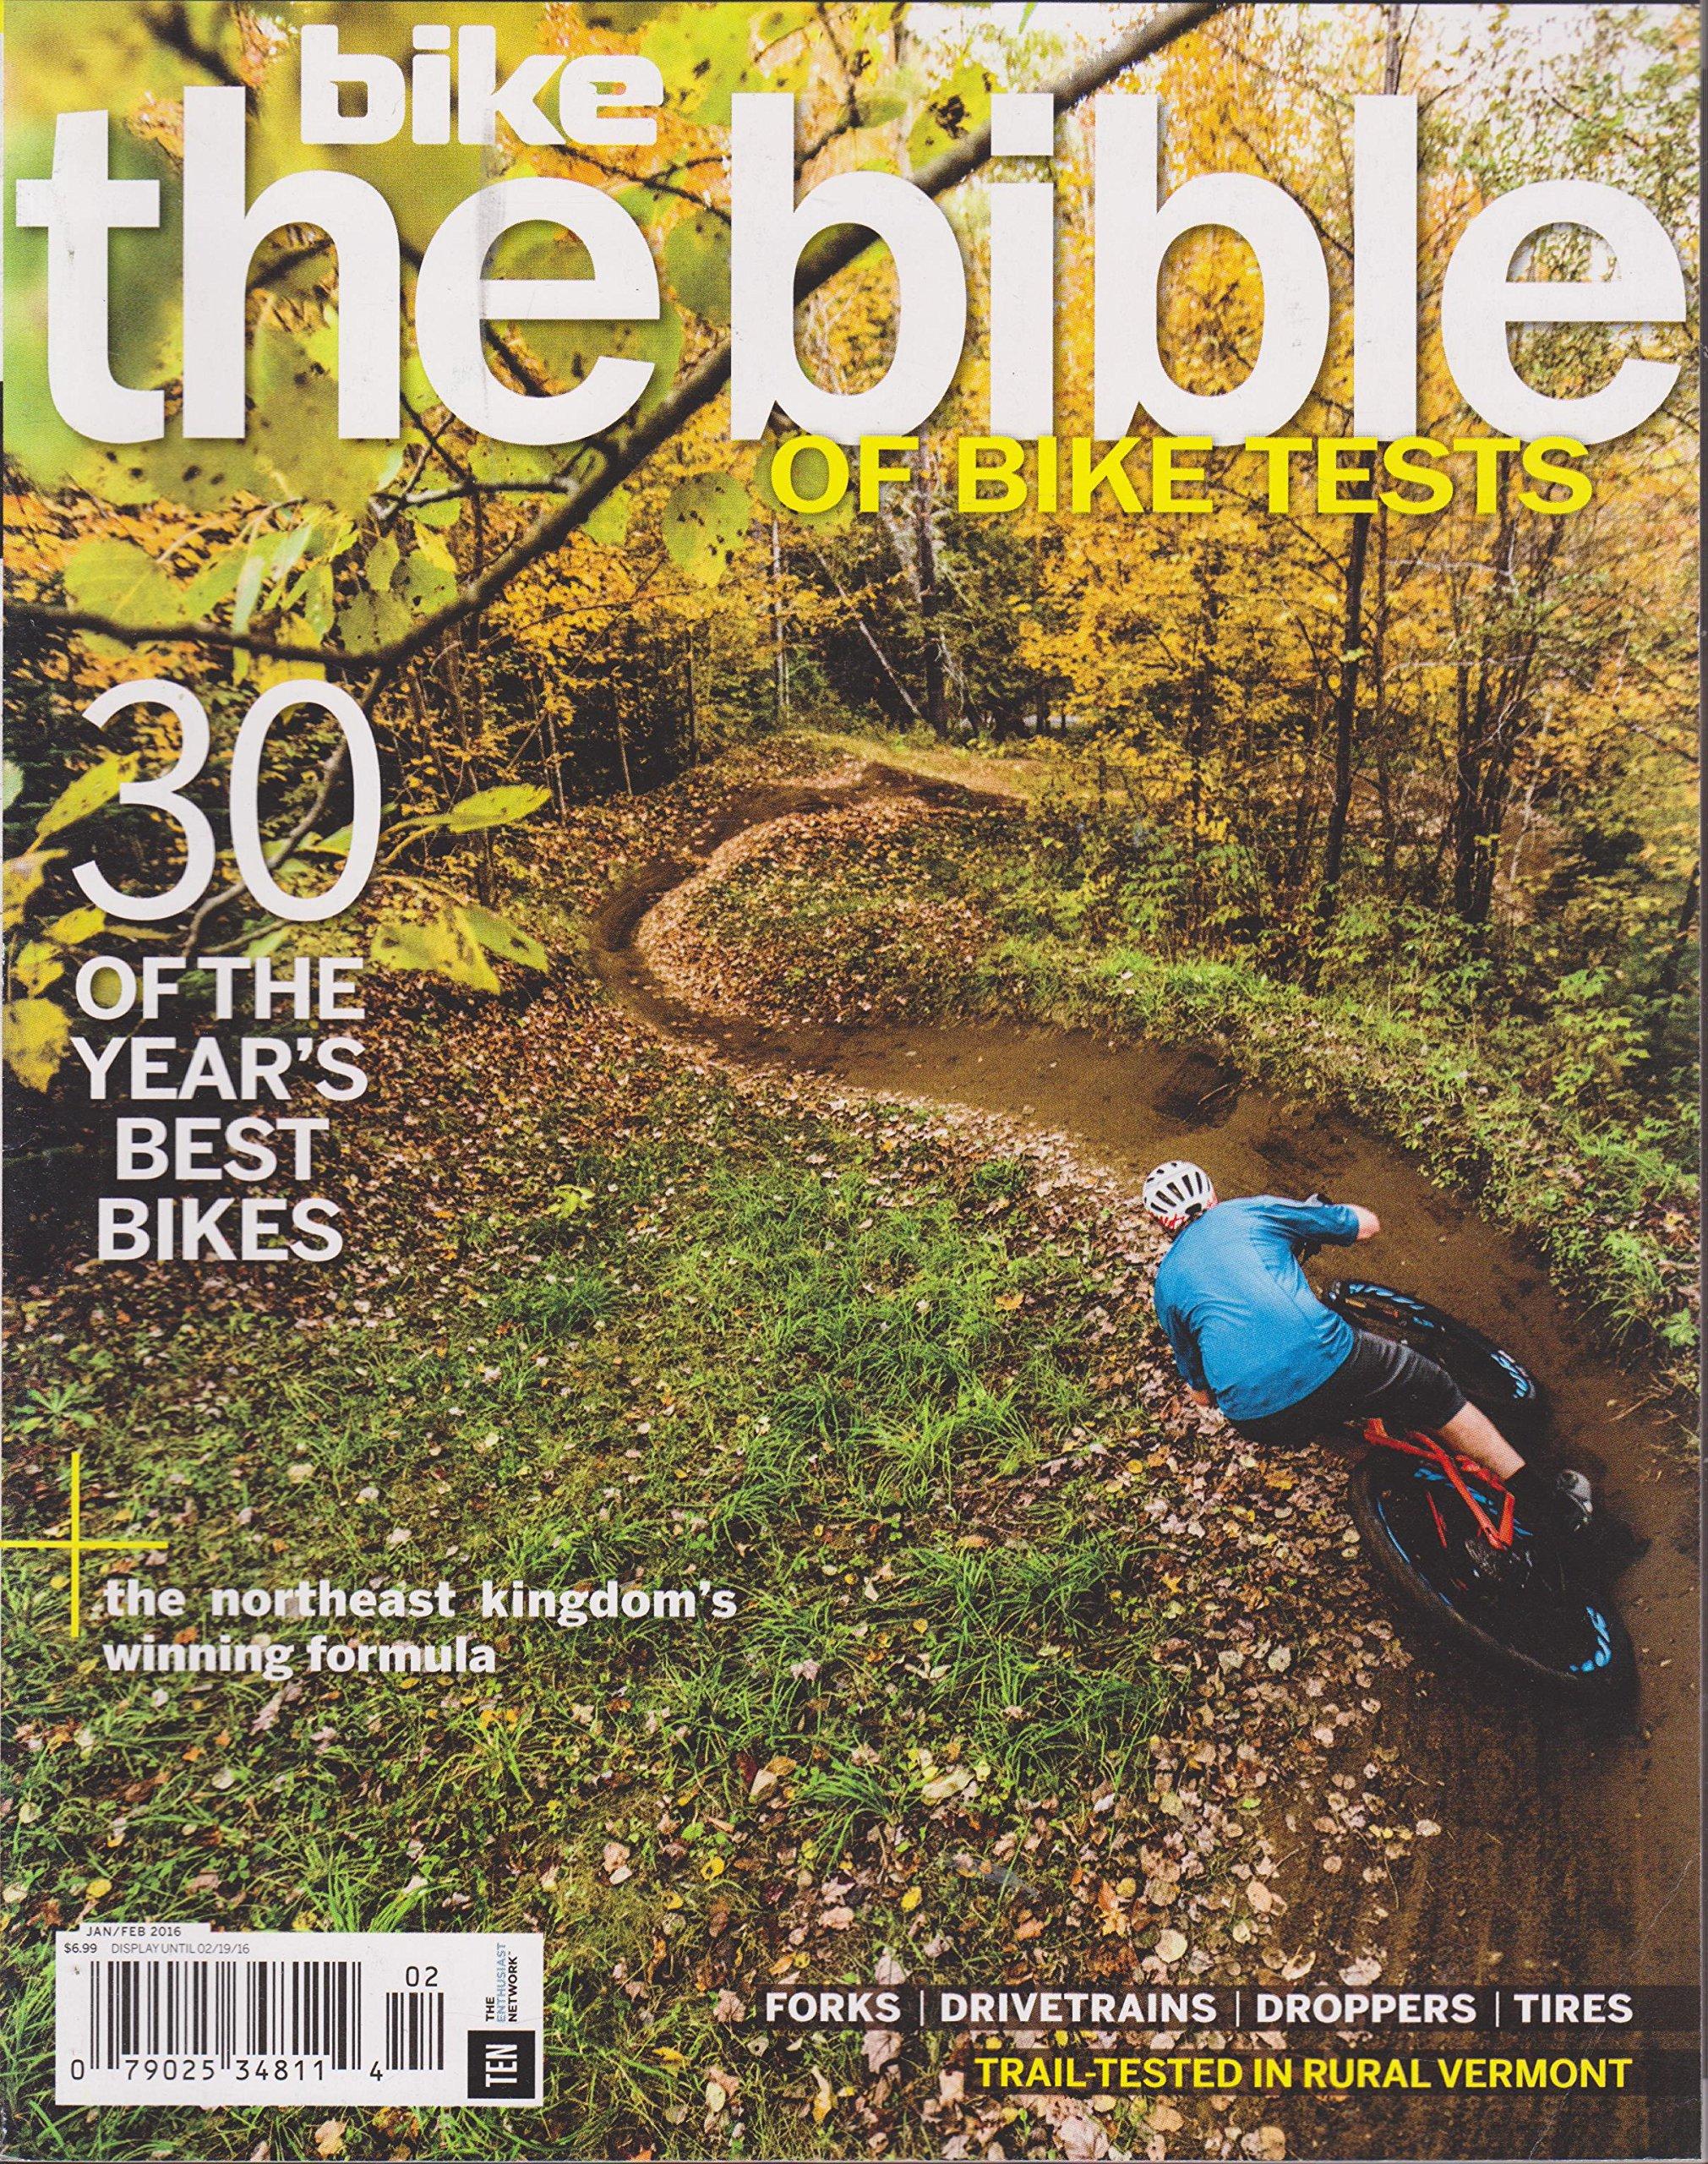 Download Bike Magazine The Bible of Test Bikes Magazine January/February 2016 pdf